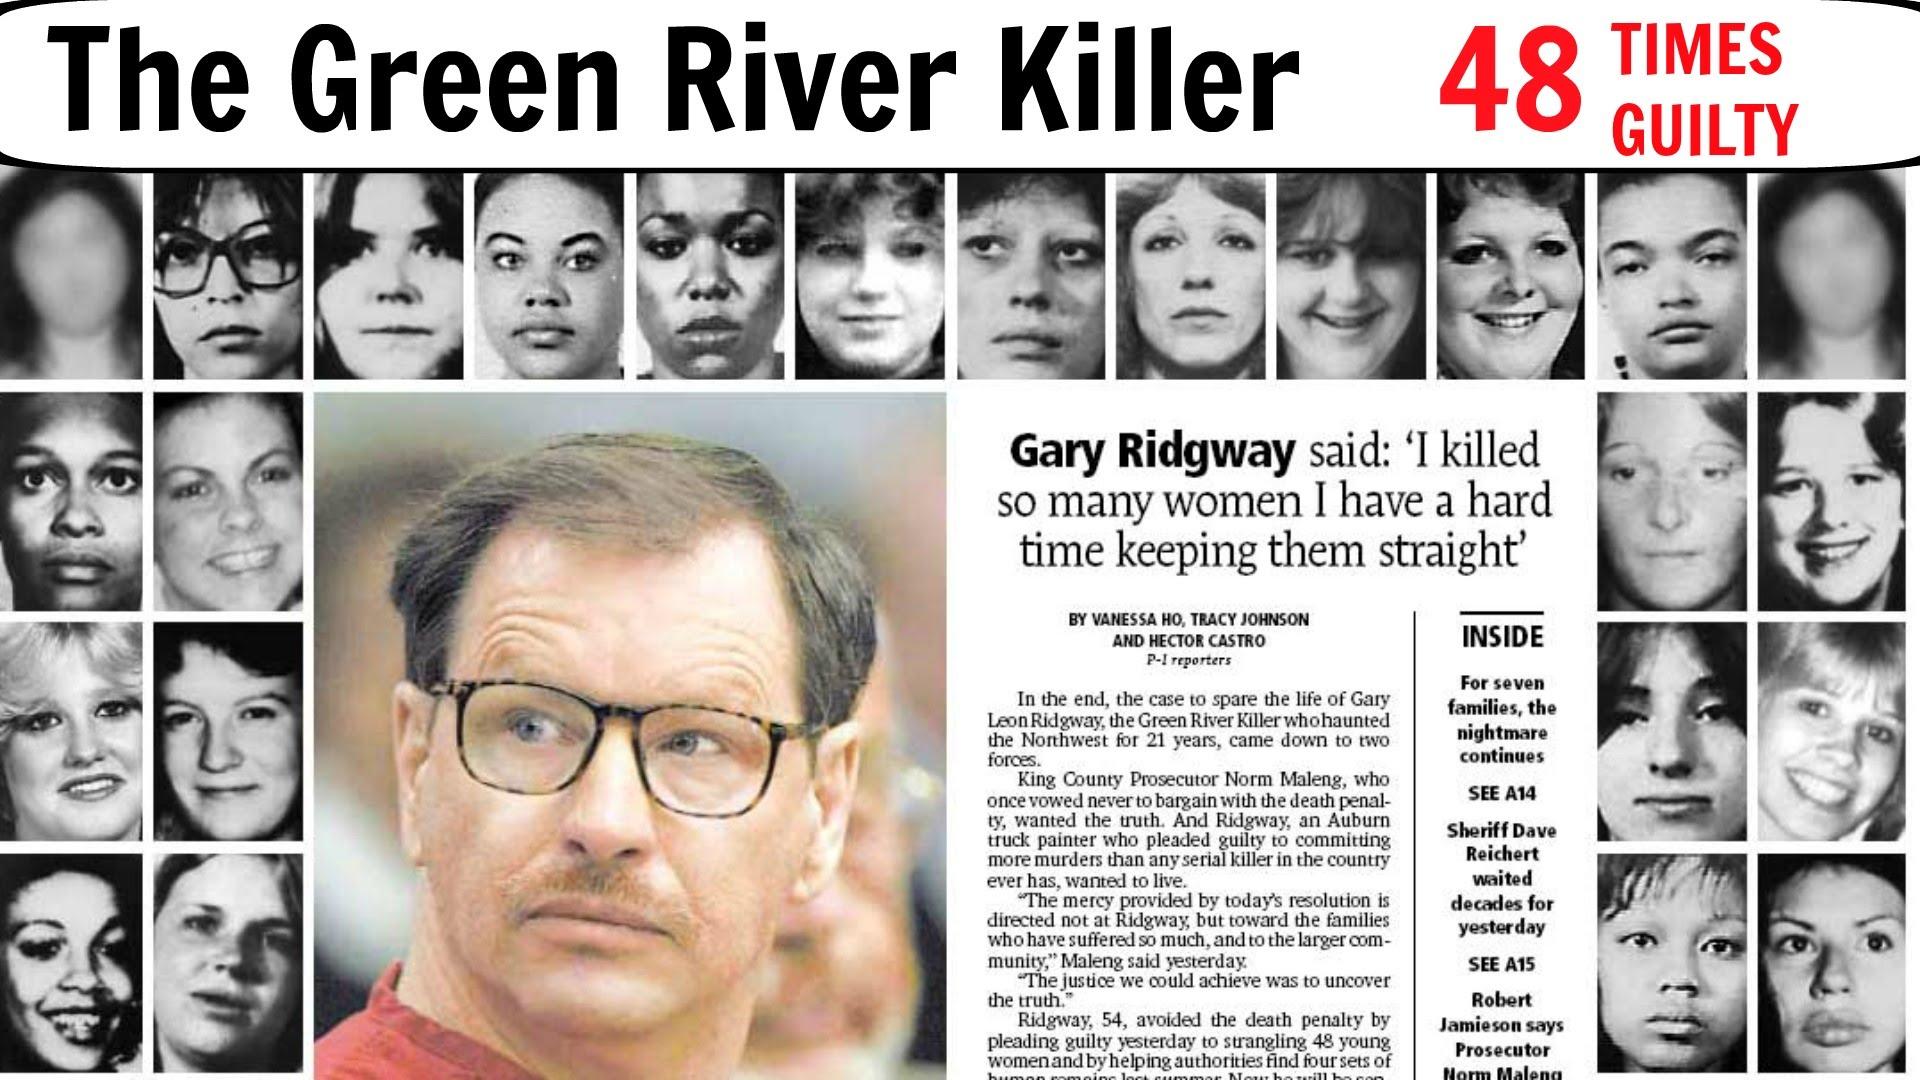 Gary Ridgway obete 2